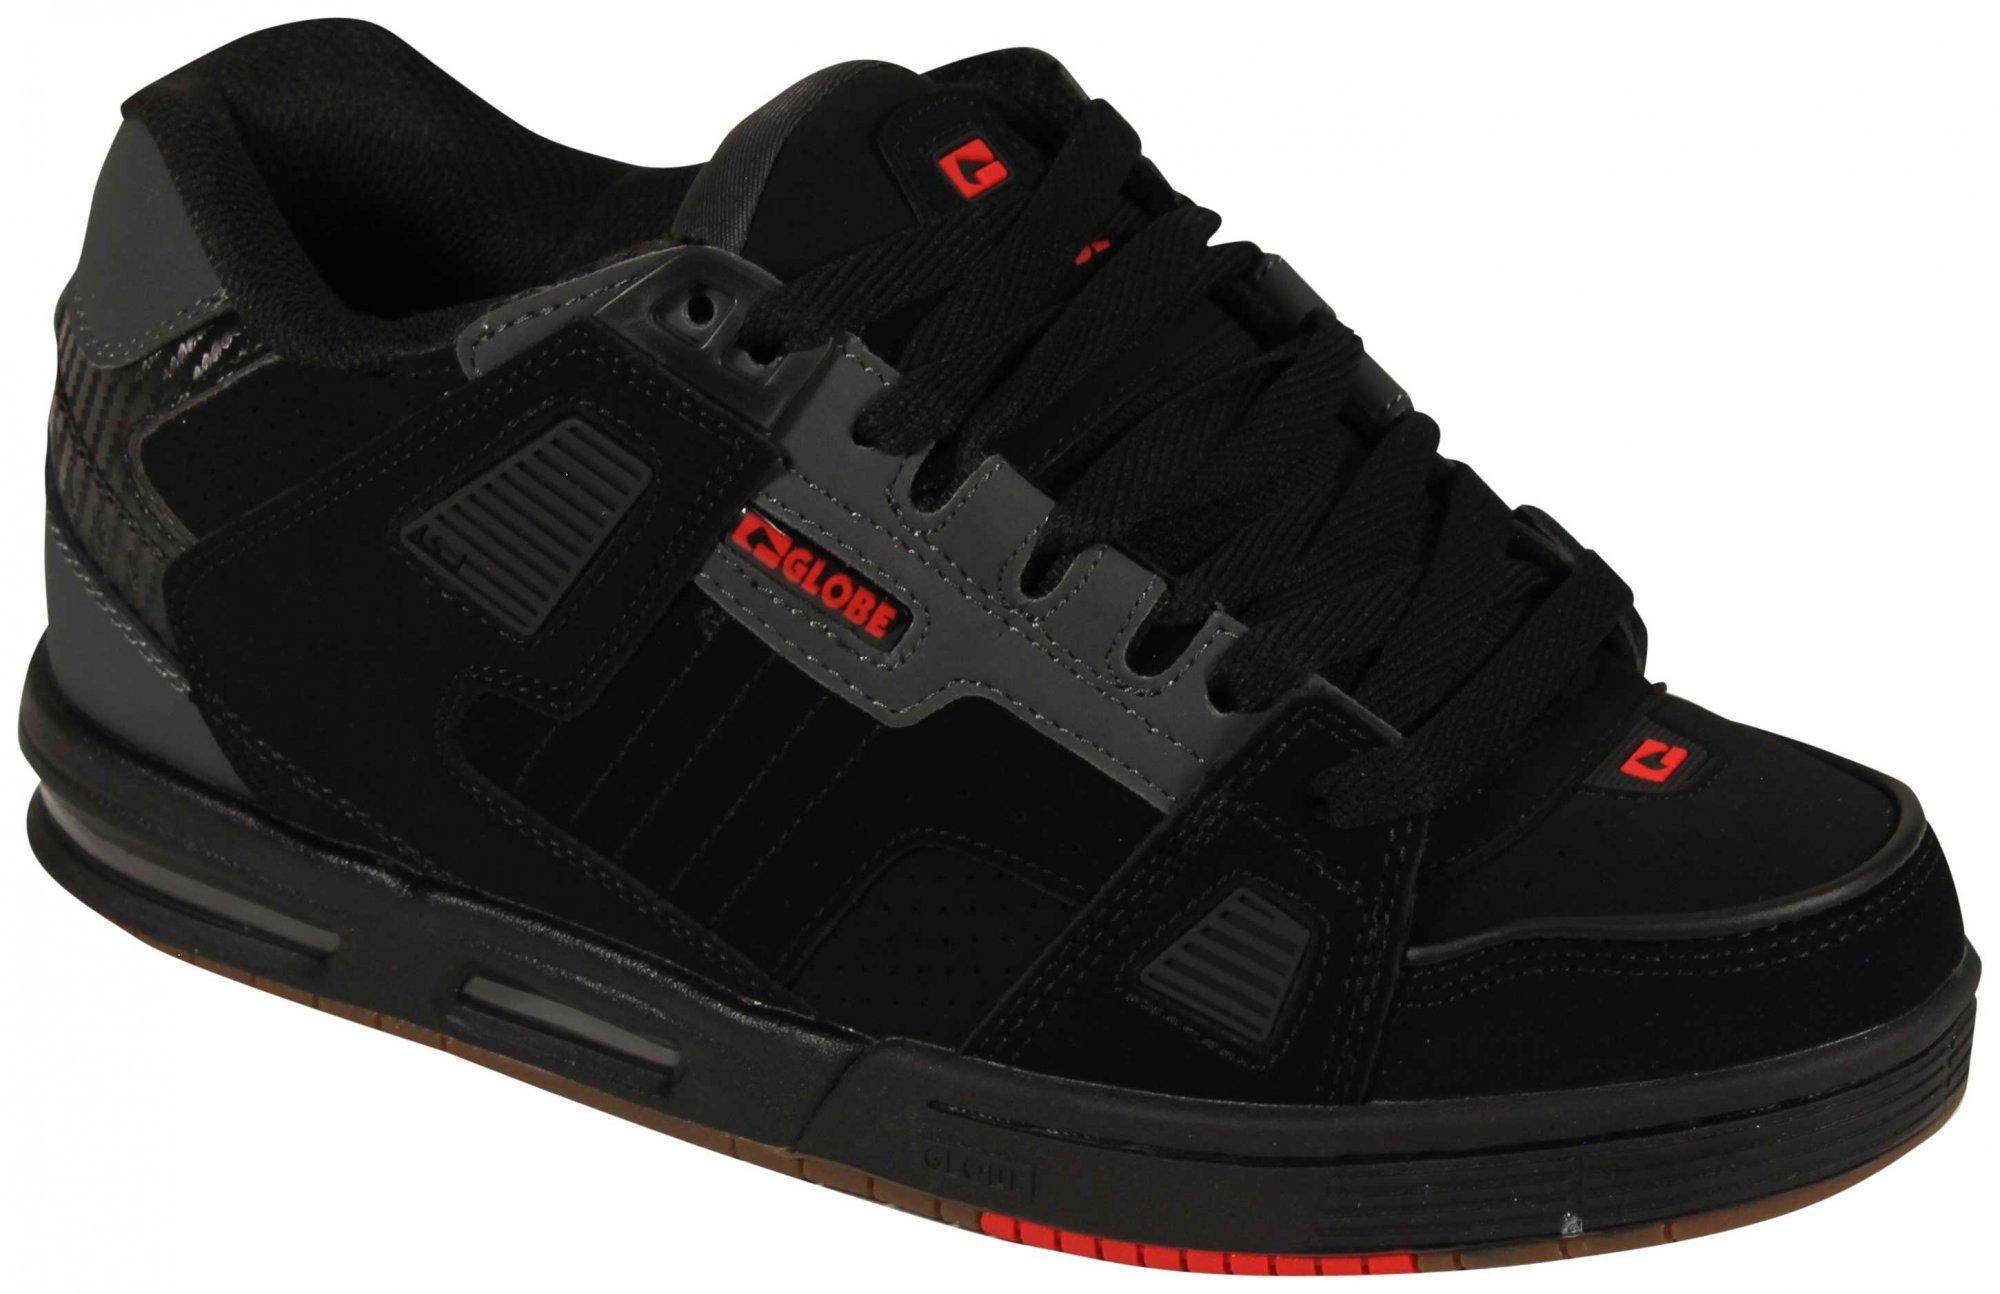 Globe Sabre Men's Shoes - Black / Charcoal / Red